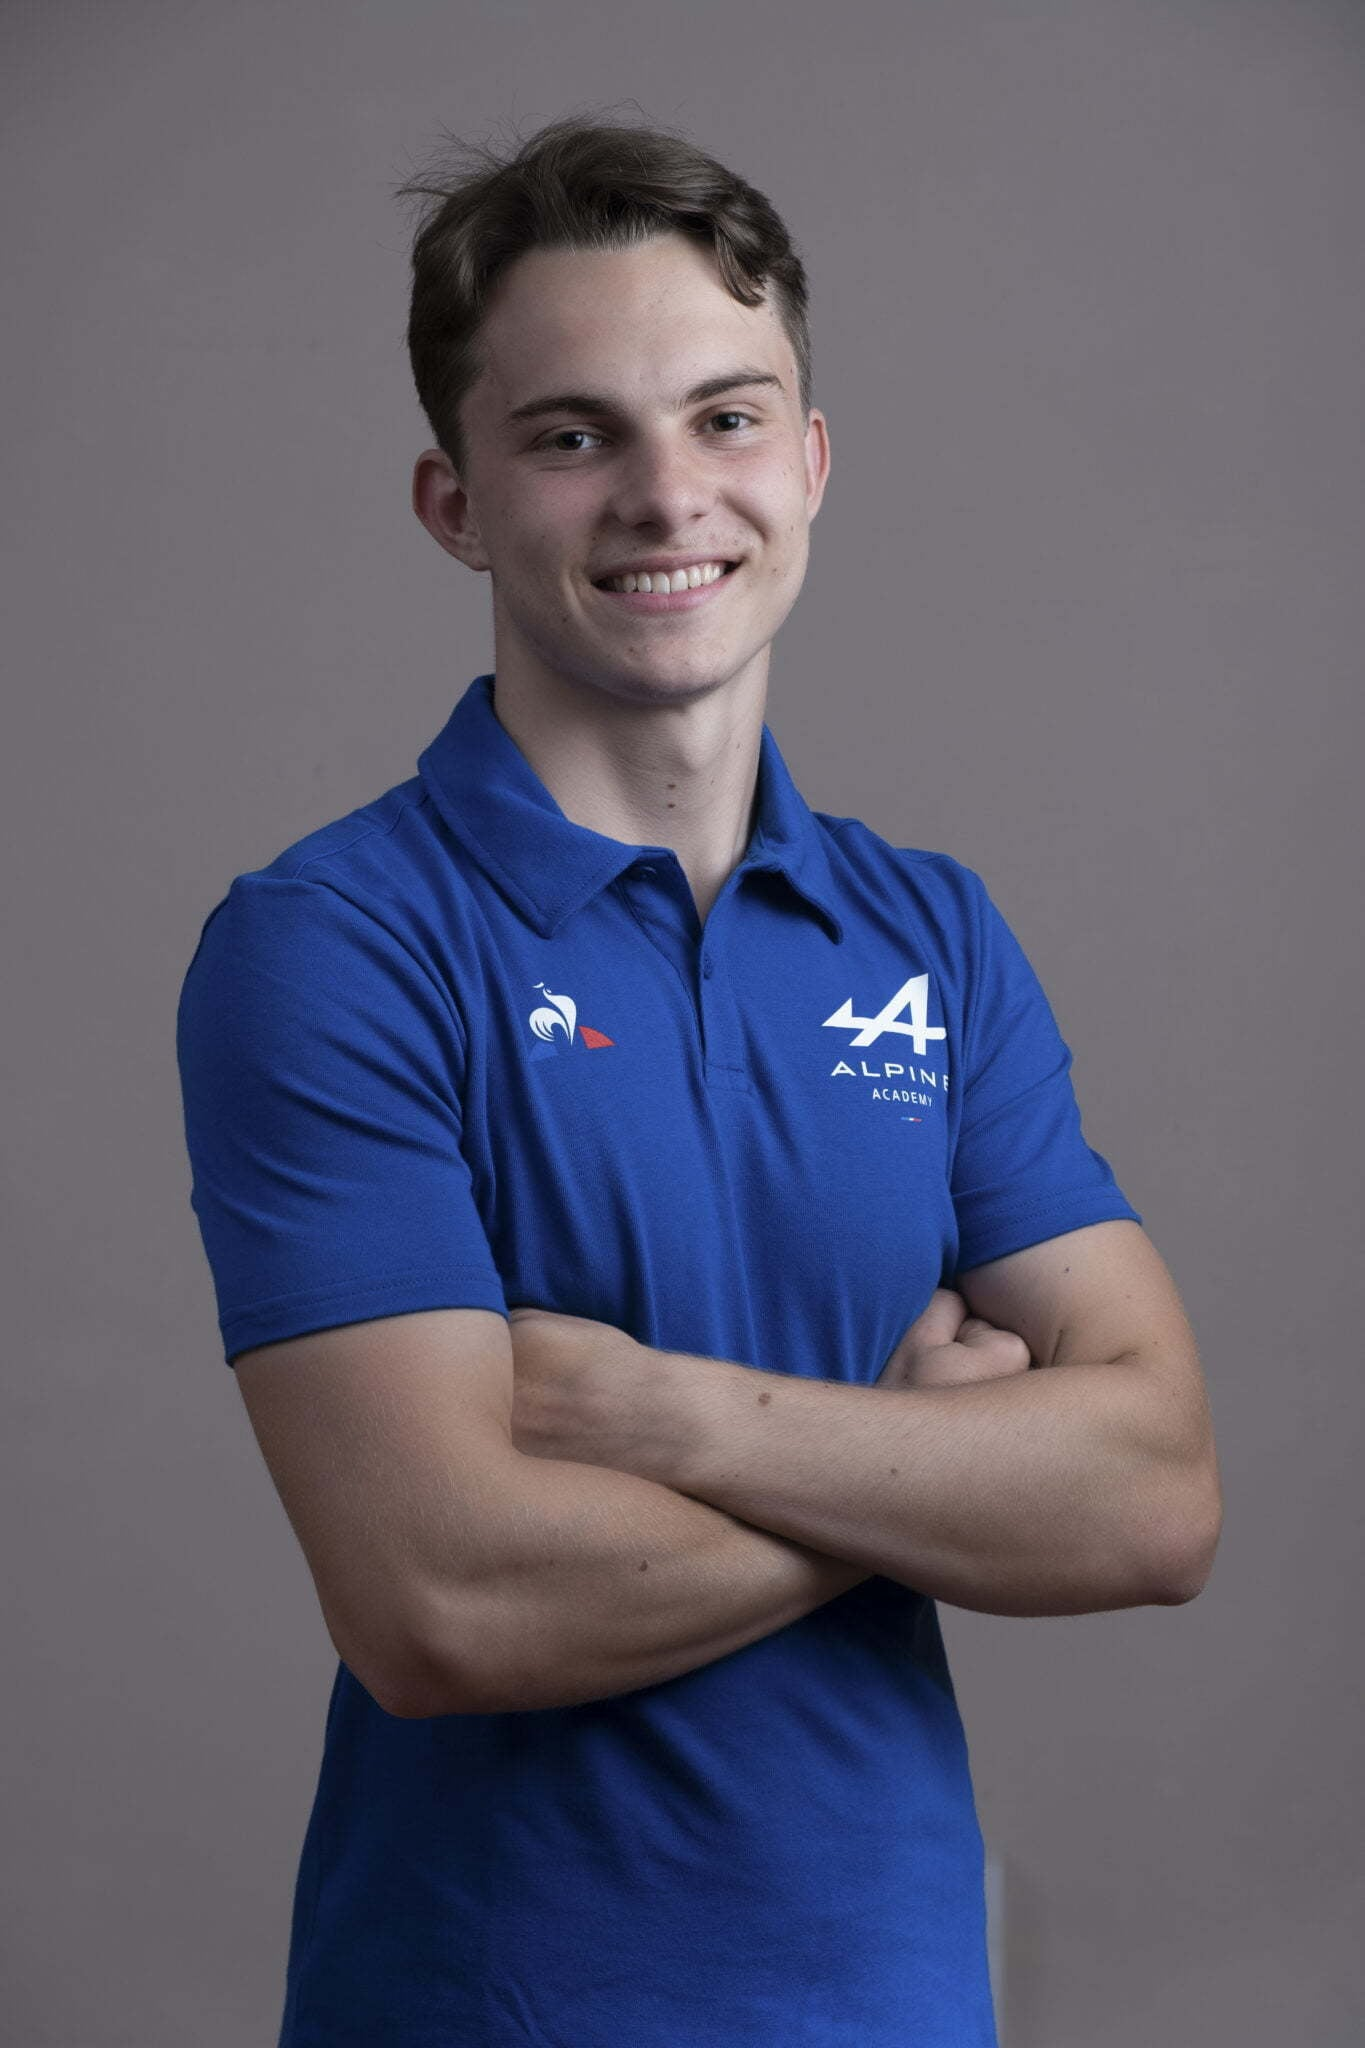 Alpine Academy Oscar Piastri